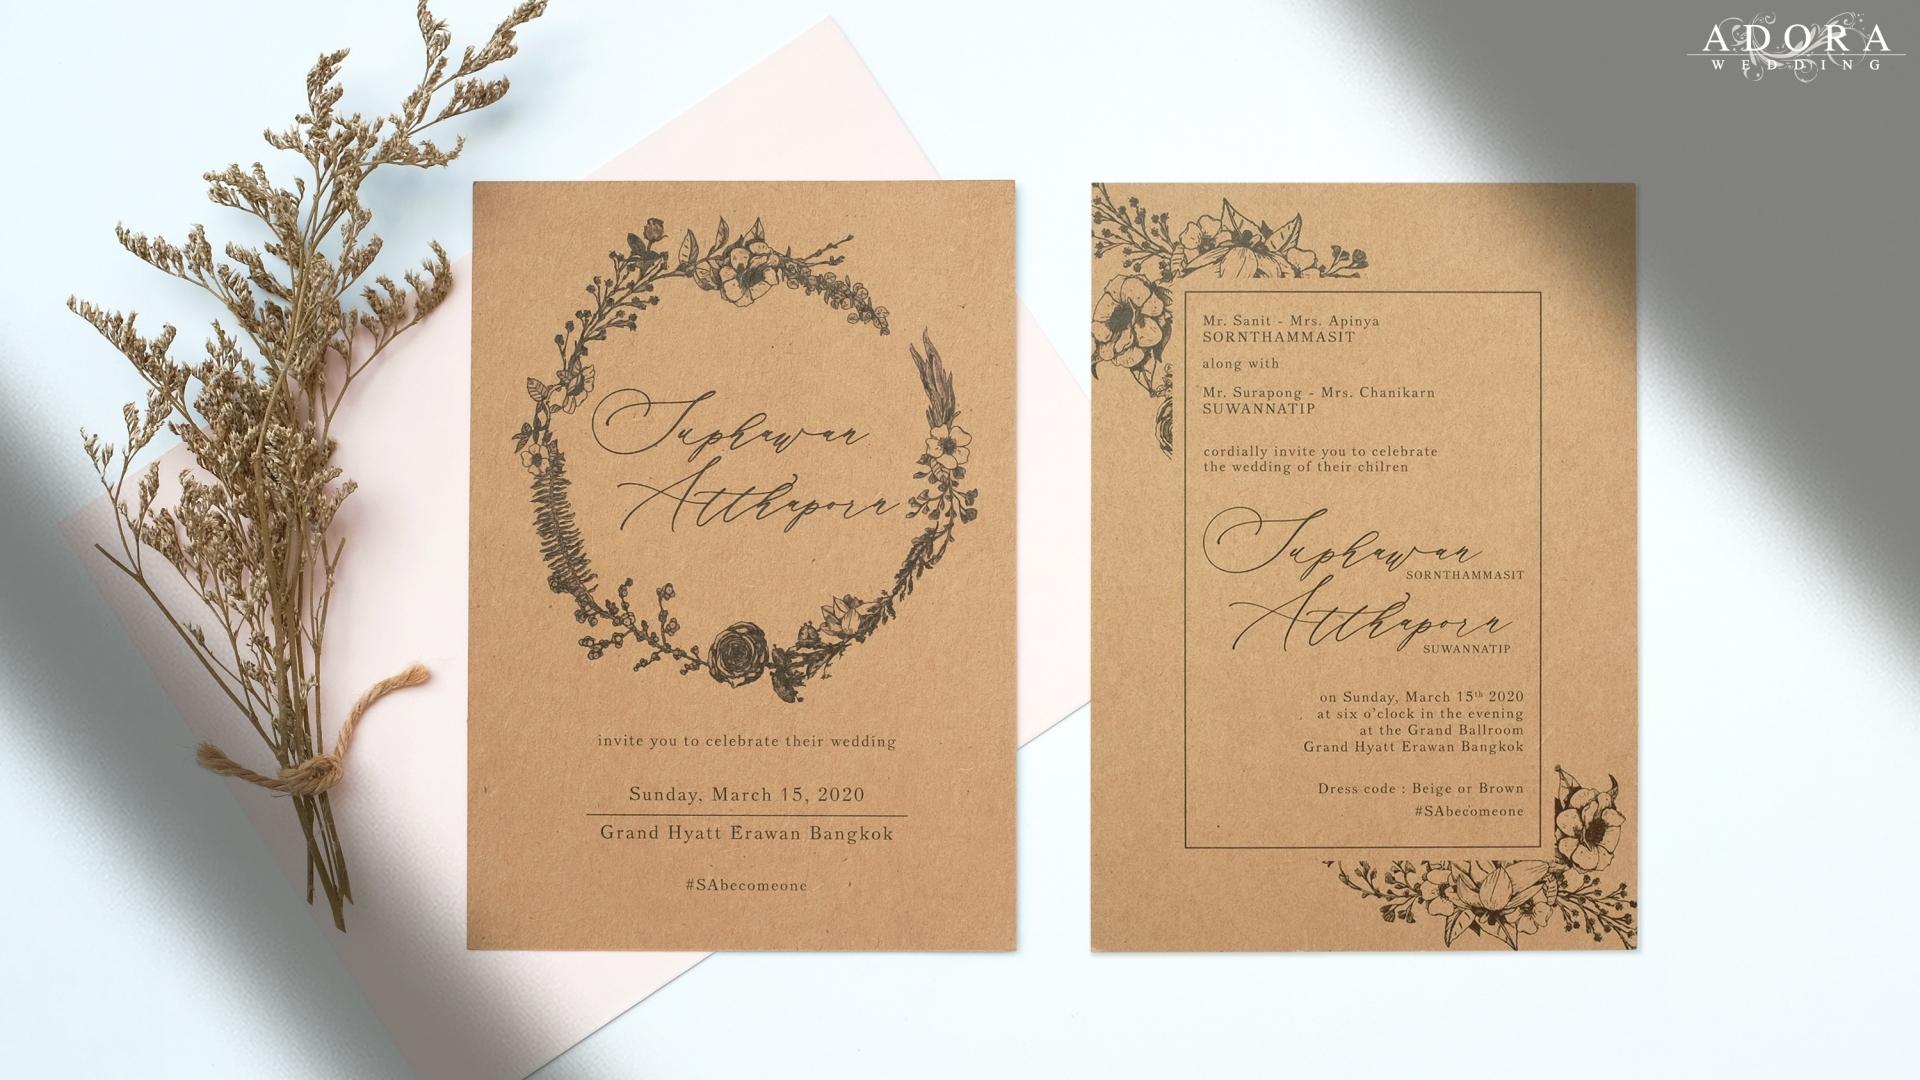 B150CR-wedding-card-1